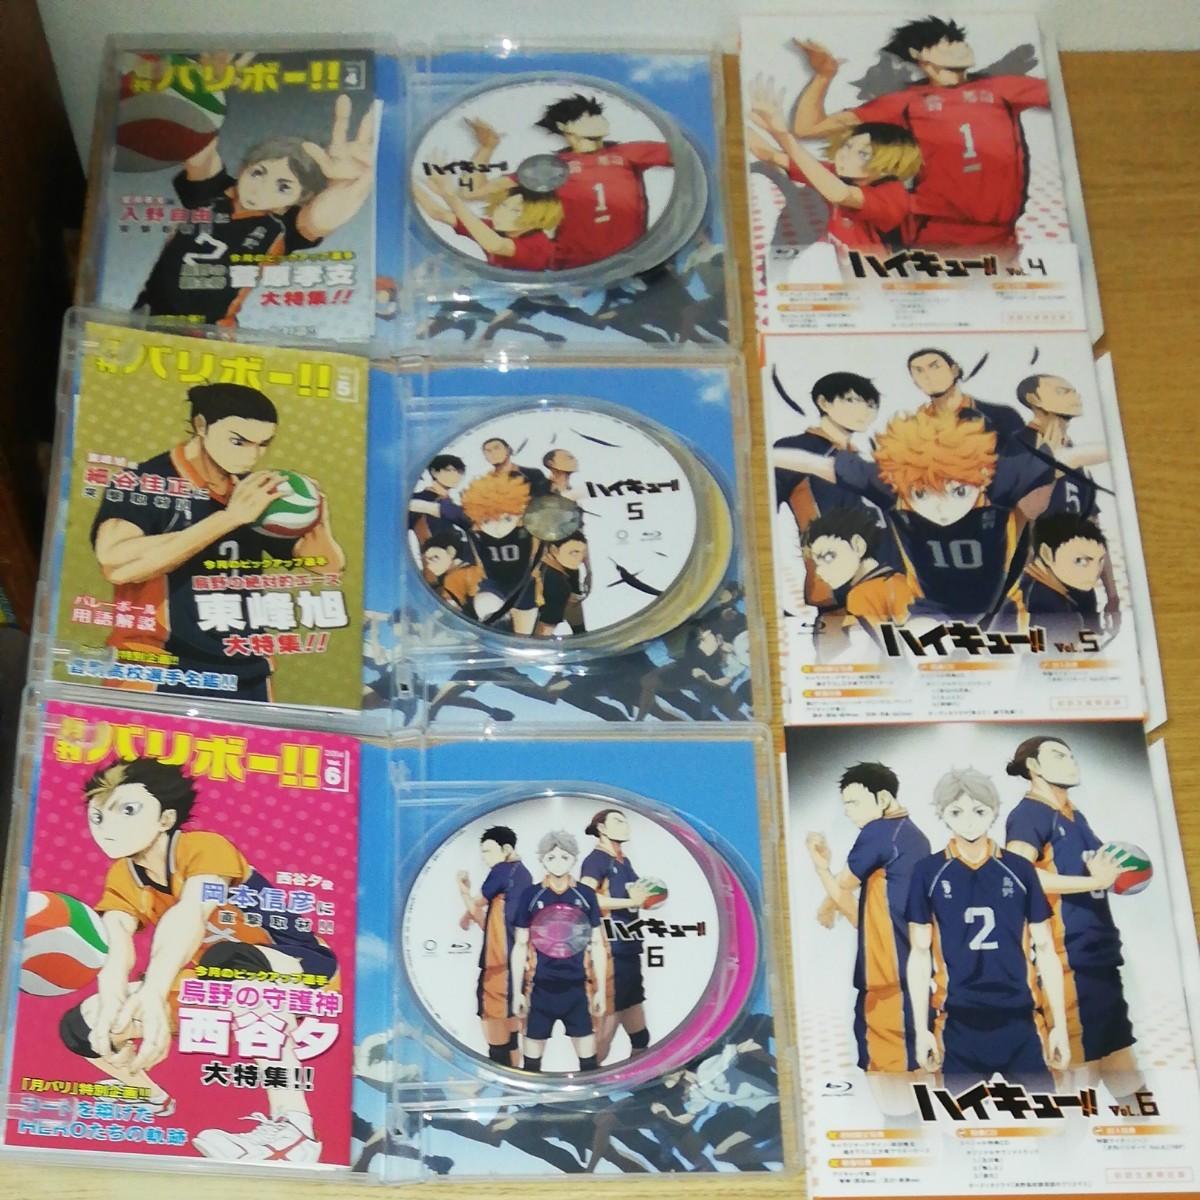 Blu-ray ハイキュー!! 初回生産限定版 全9巻セット TSUTAYA限定全巻収納BOX付き